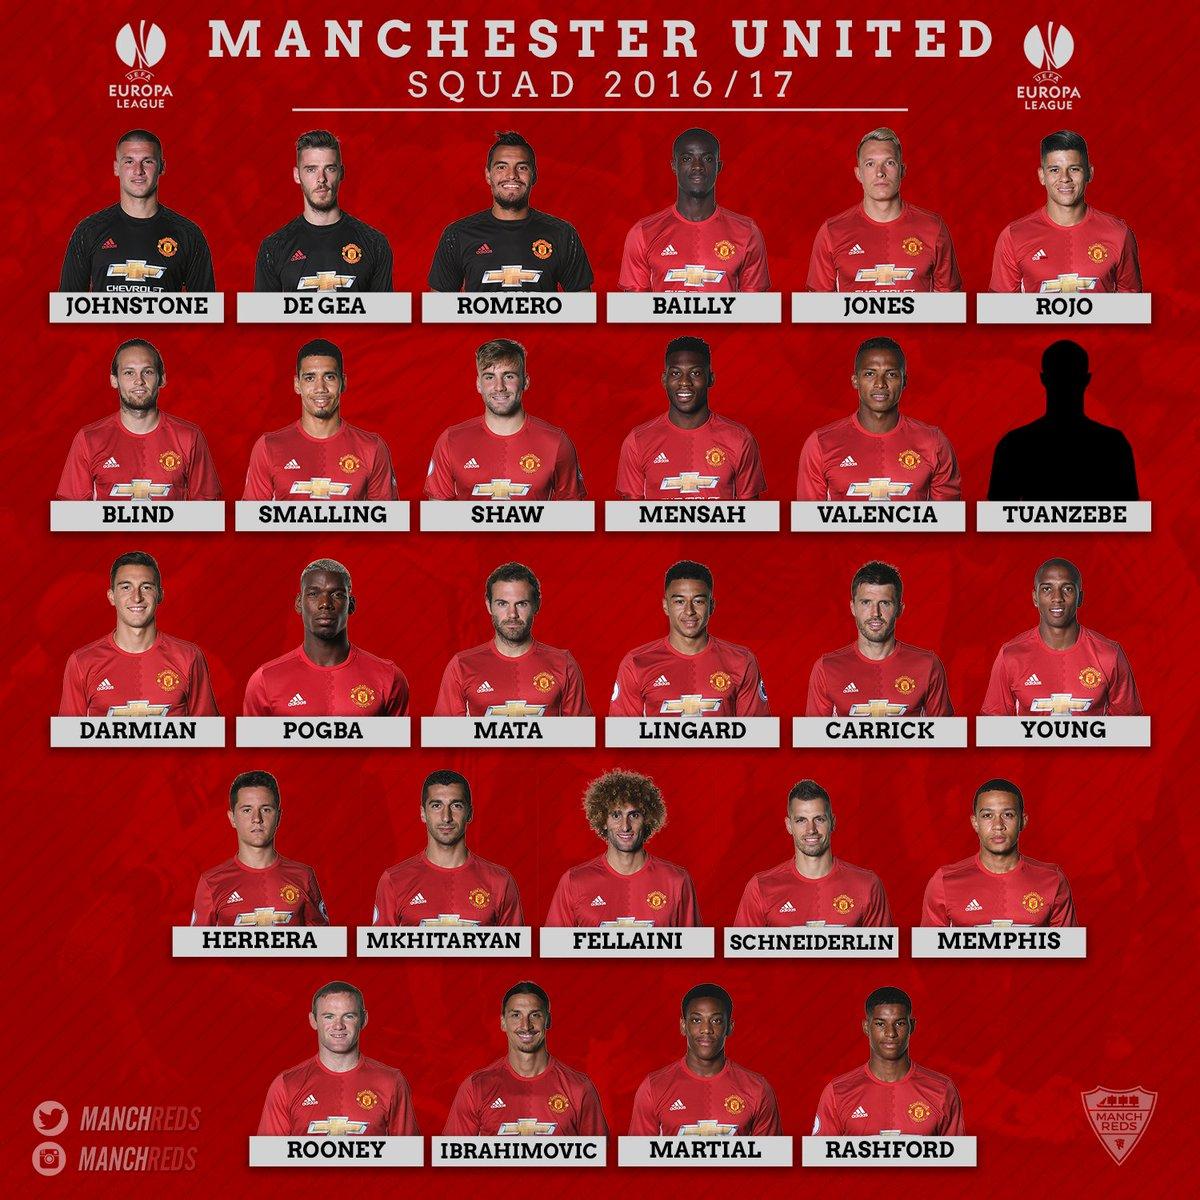 Image result for man utd team photo 2016/17